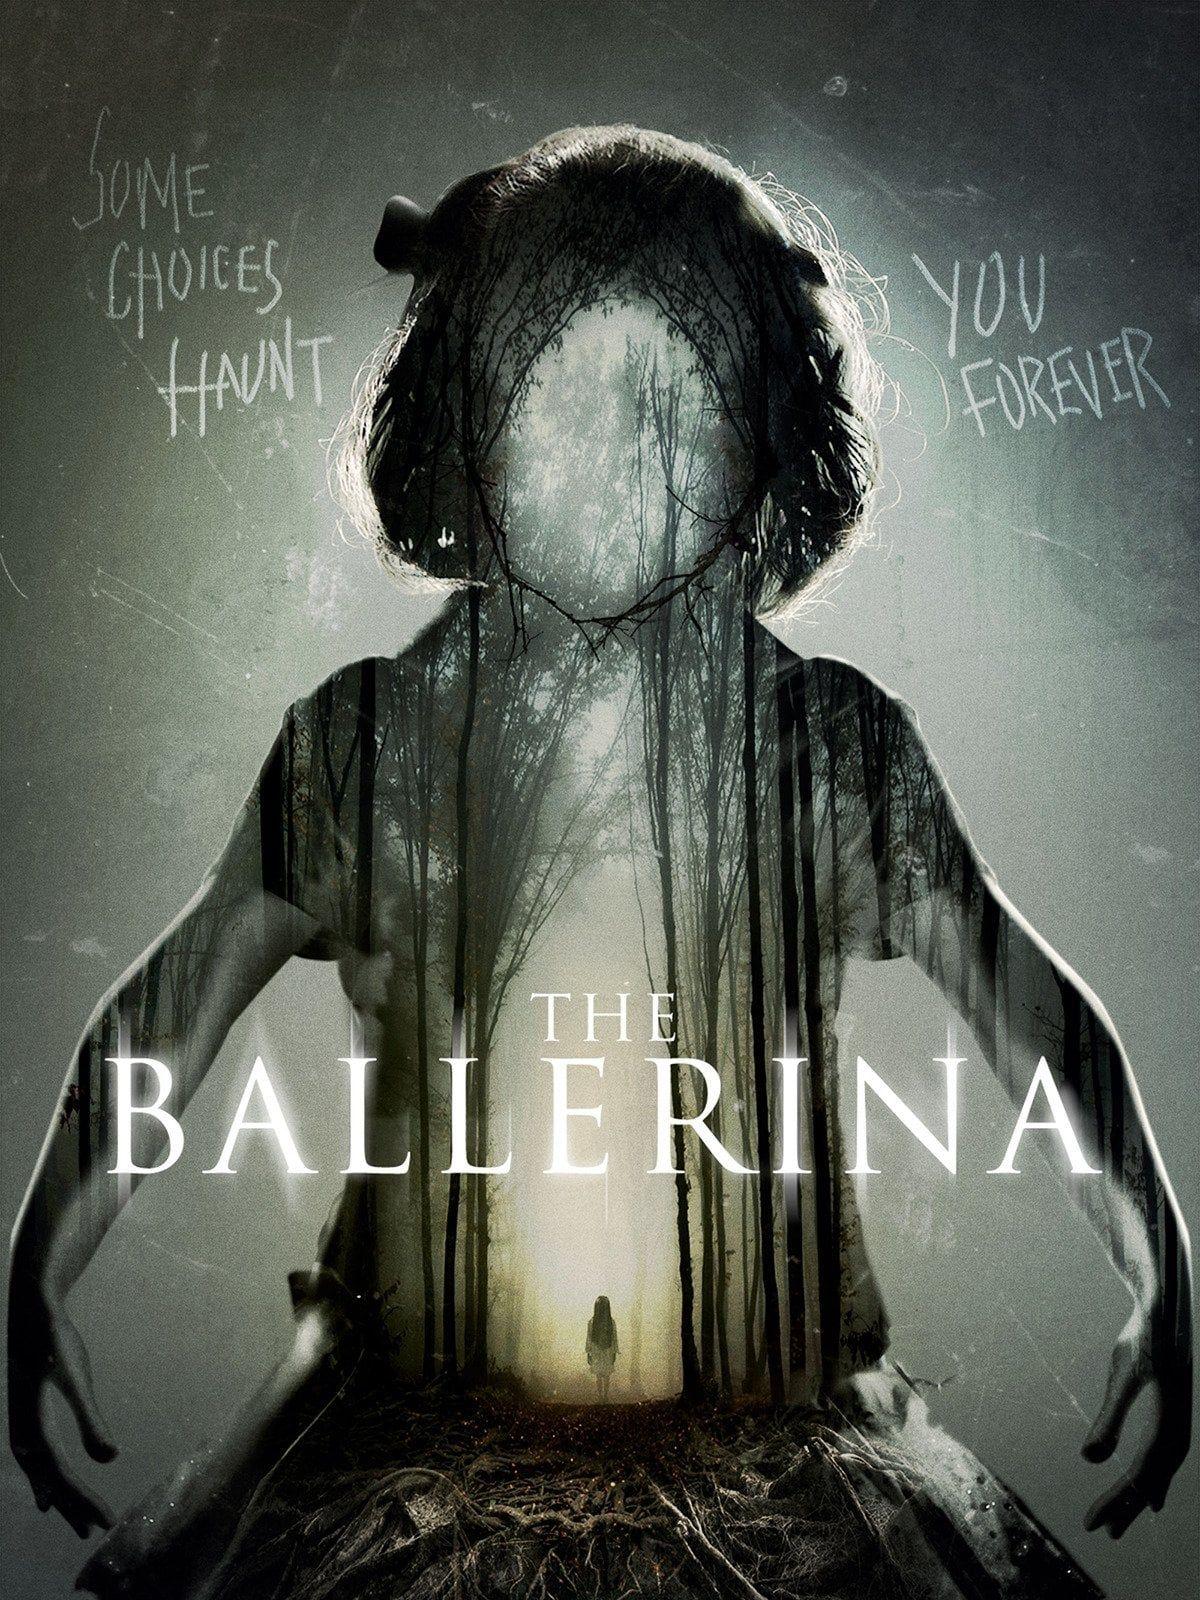 Pin By Maya Alsafadi On Maya Ballerina Film Full Films The Image Movie